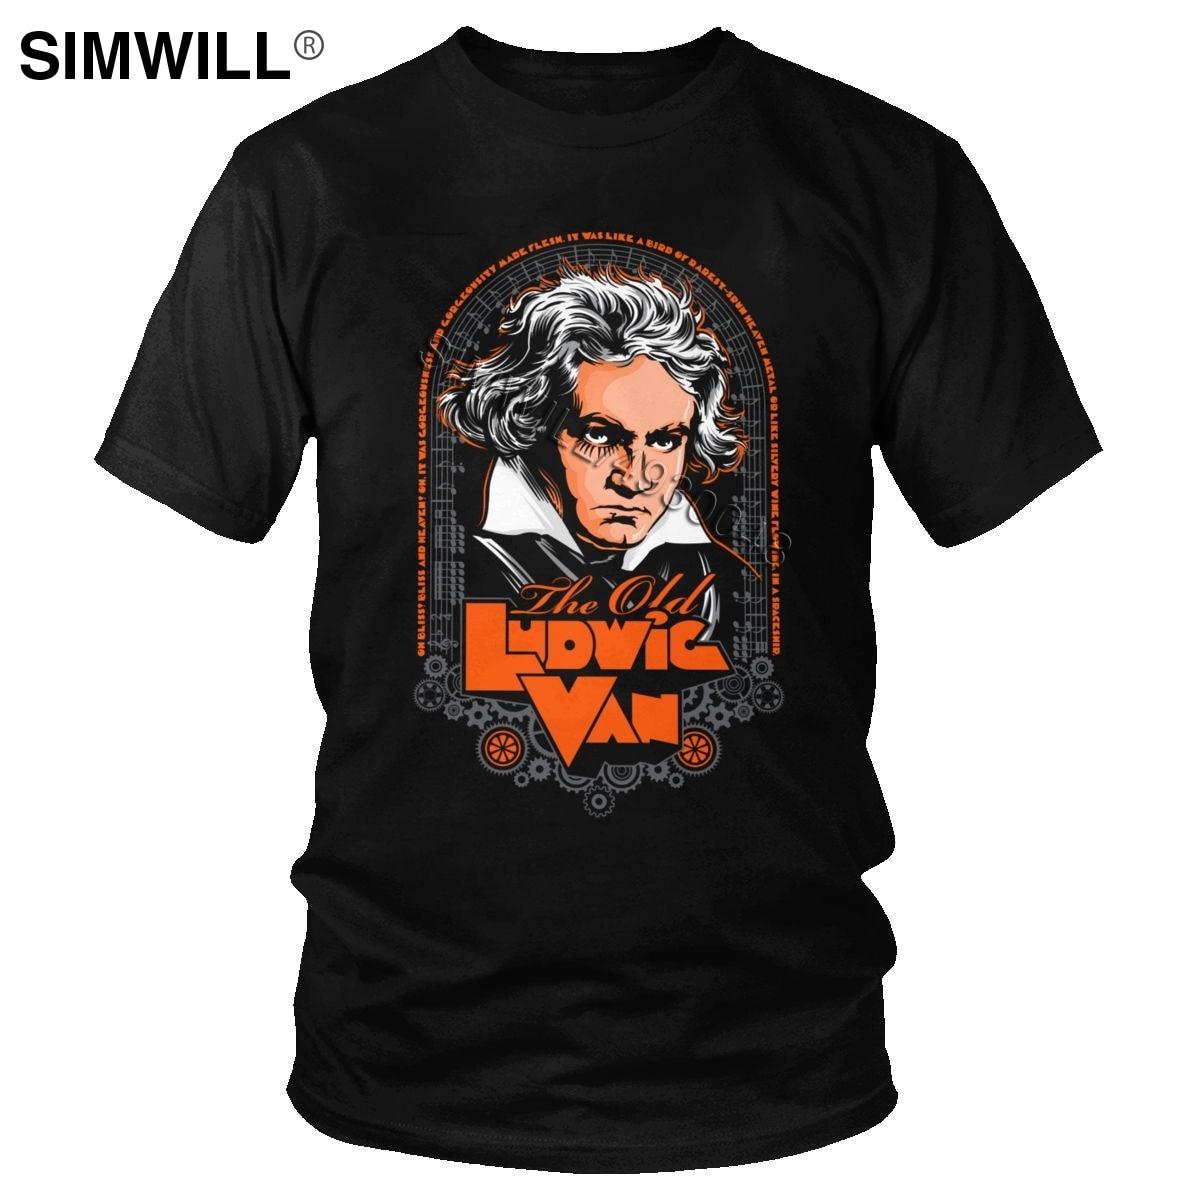 Vintage ludwig van beethoven t camisa masculina música clássica compositor t-shirts manga curta algodão gráfico t fãs roupas presente